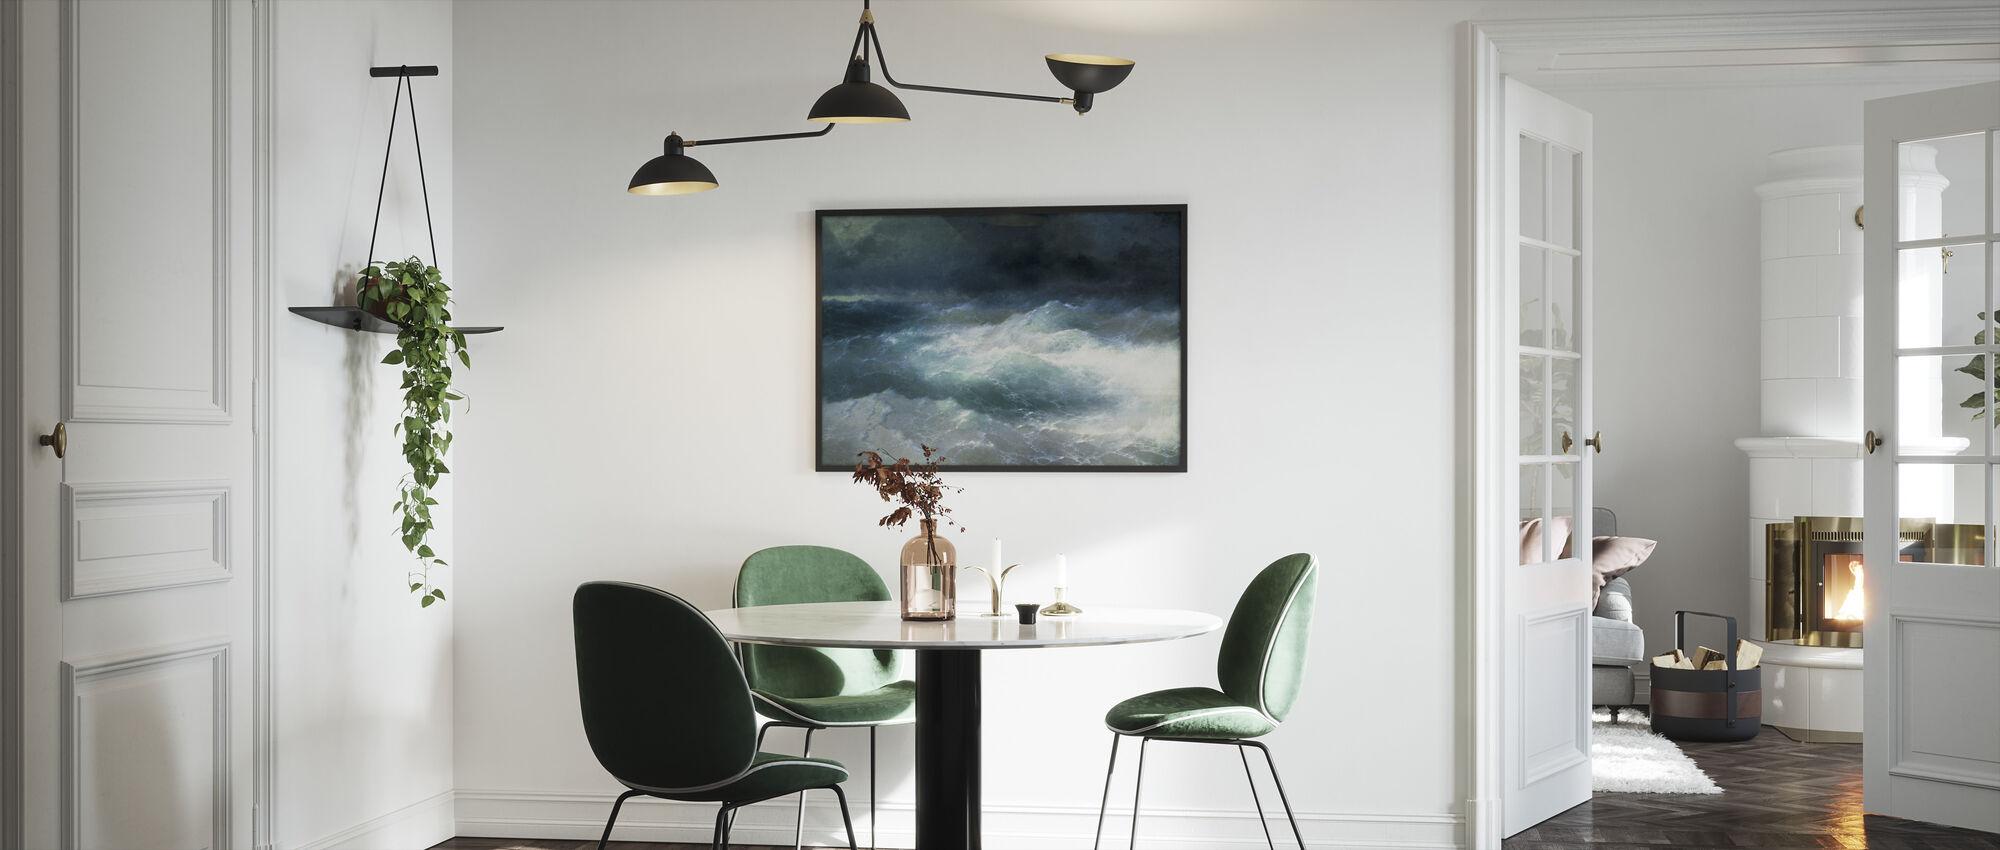 Between the Waves - Ivan Aivazovsky - Framed print - Kitchen